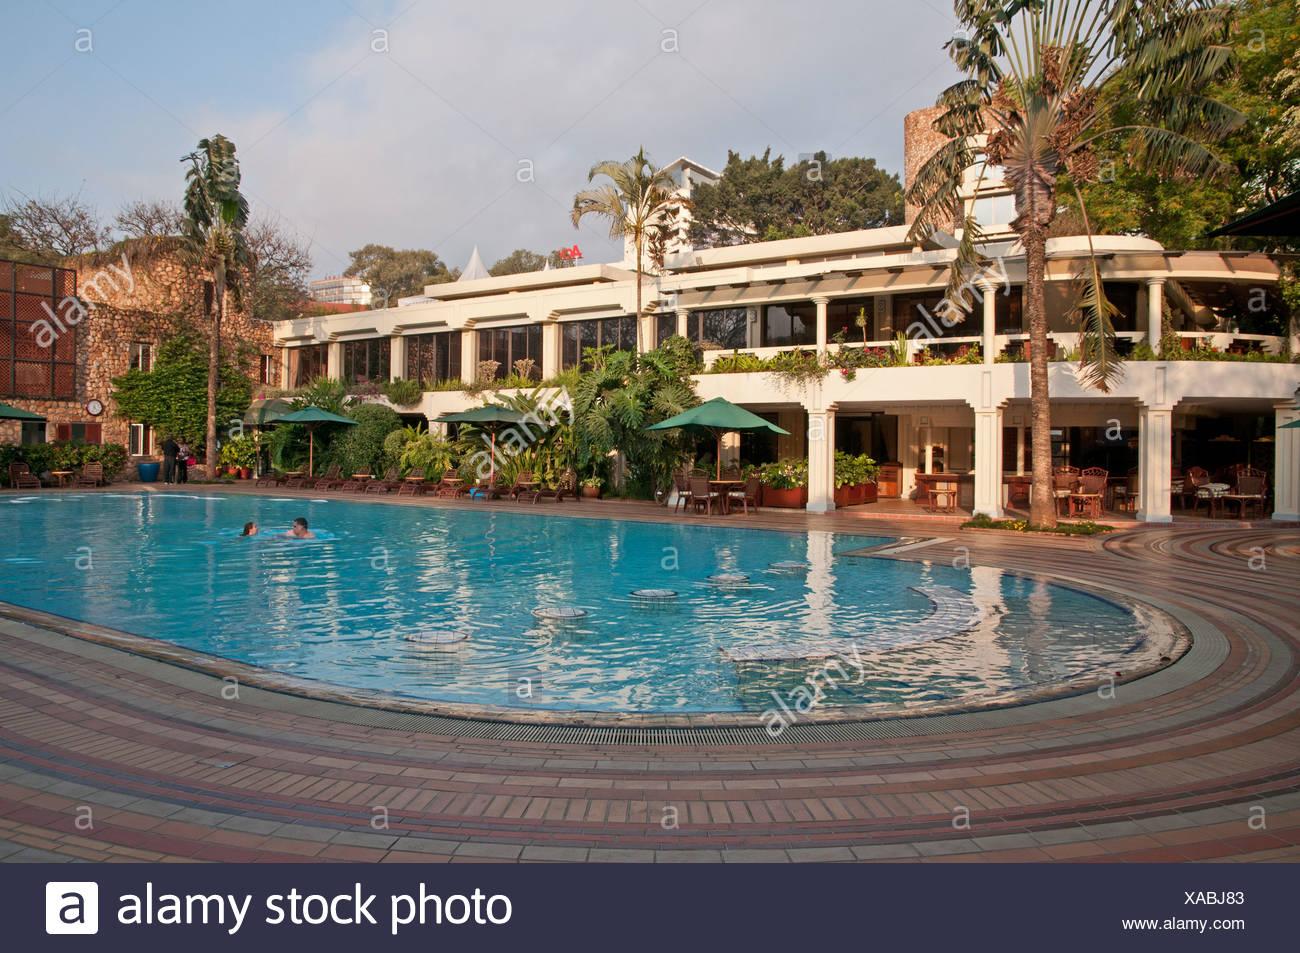 Nairobi Serena Hotel swimming pool with two swimmers Kenya - Stock Image